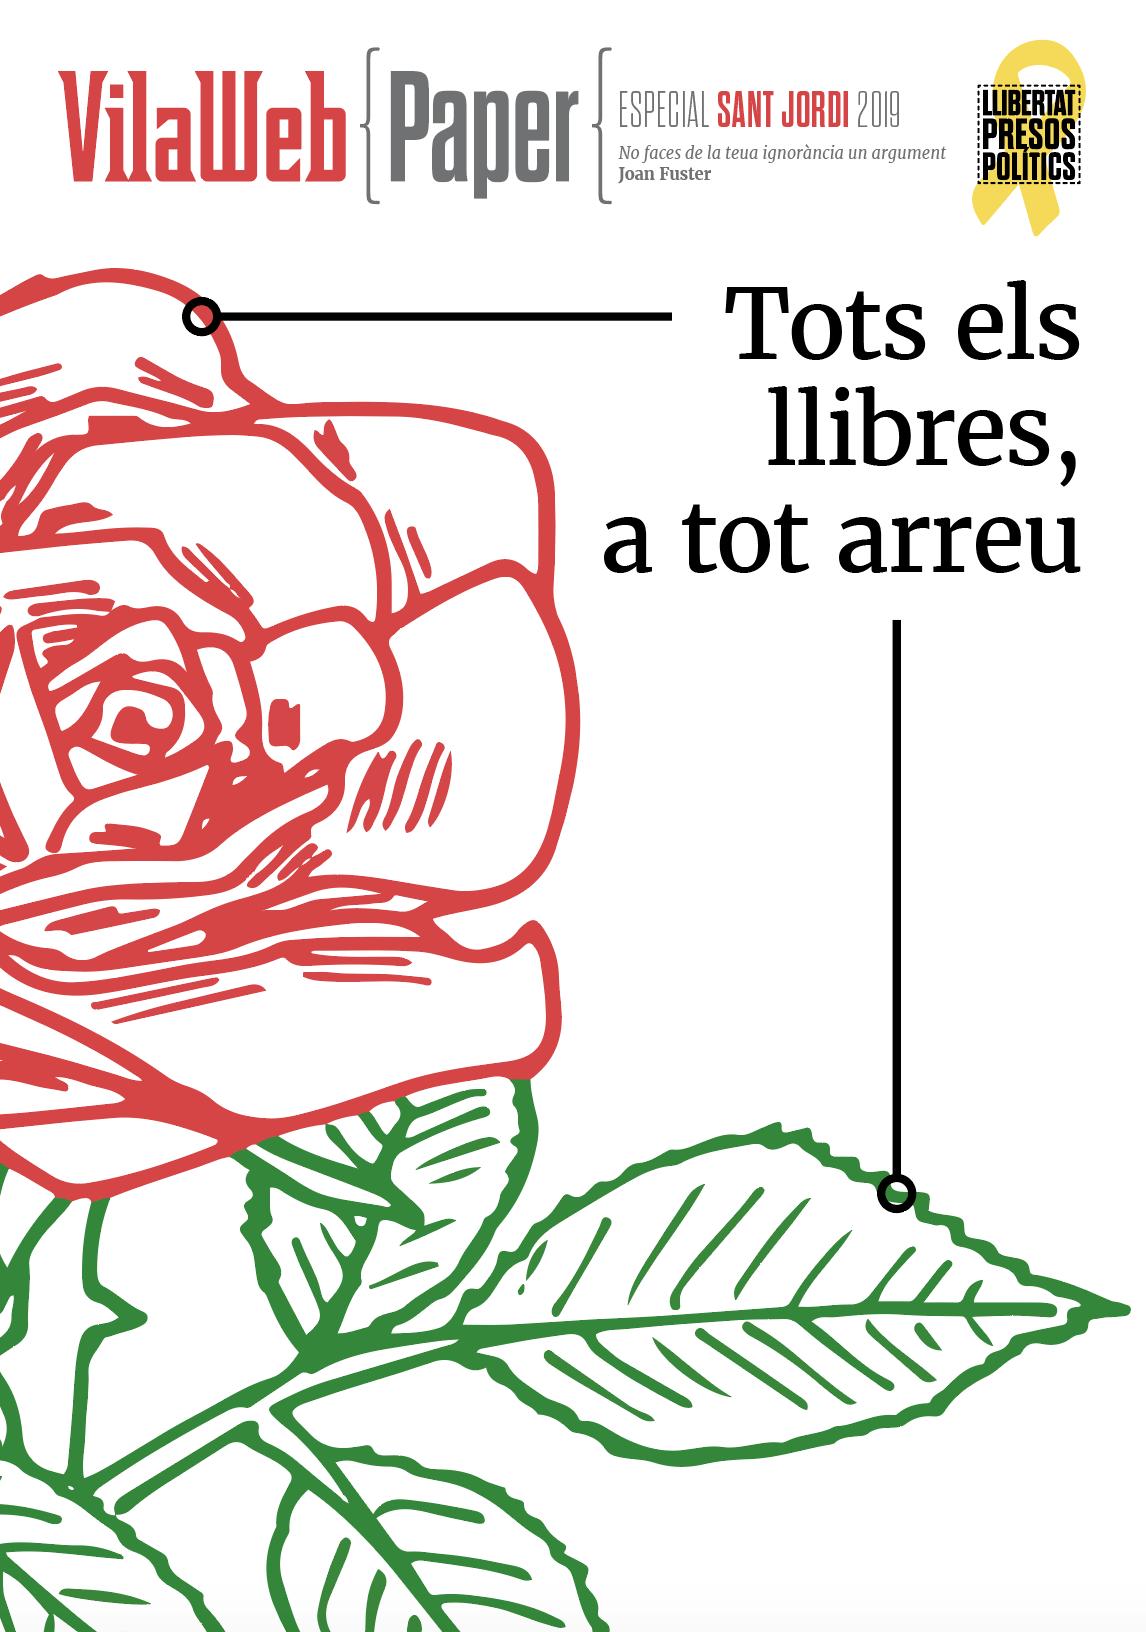 Sant Jordi VilaWeb Paper